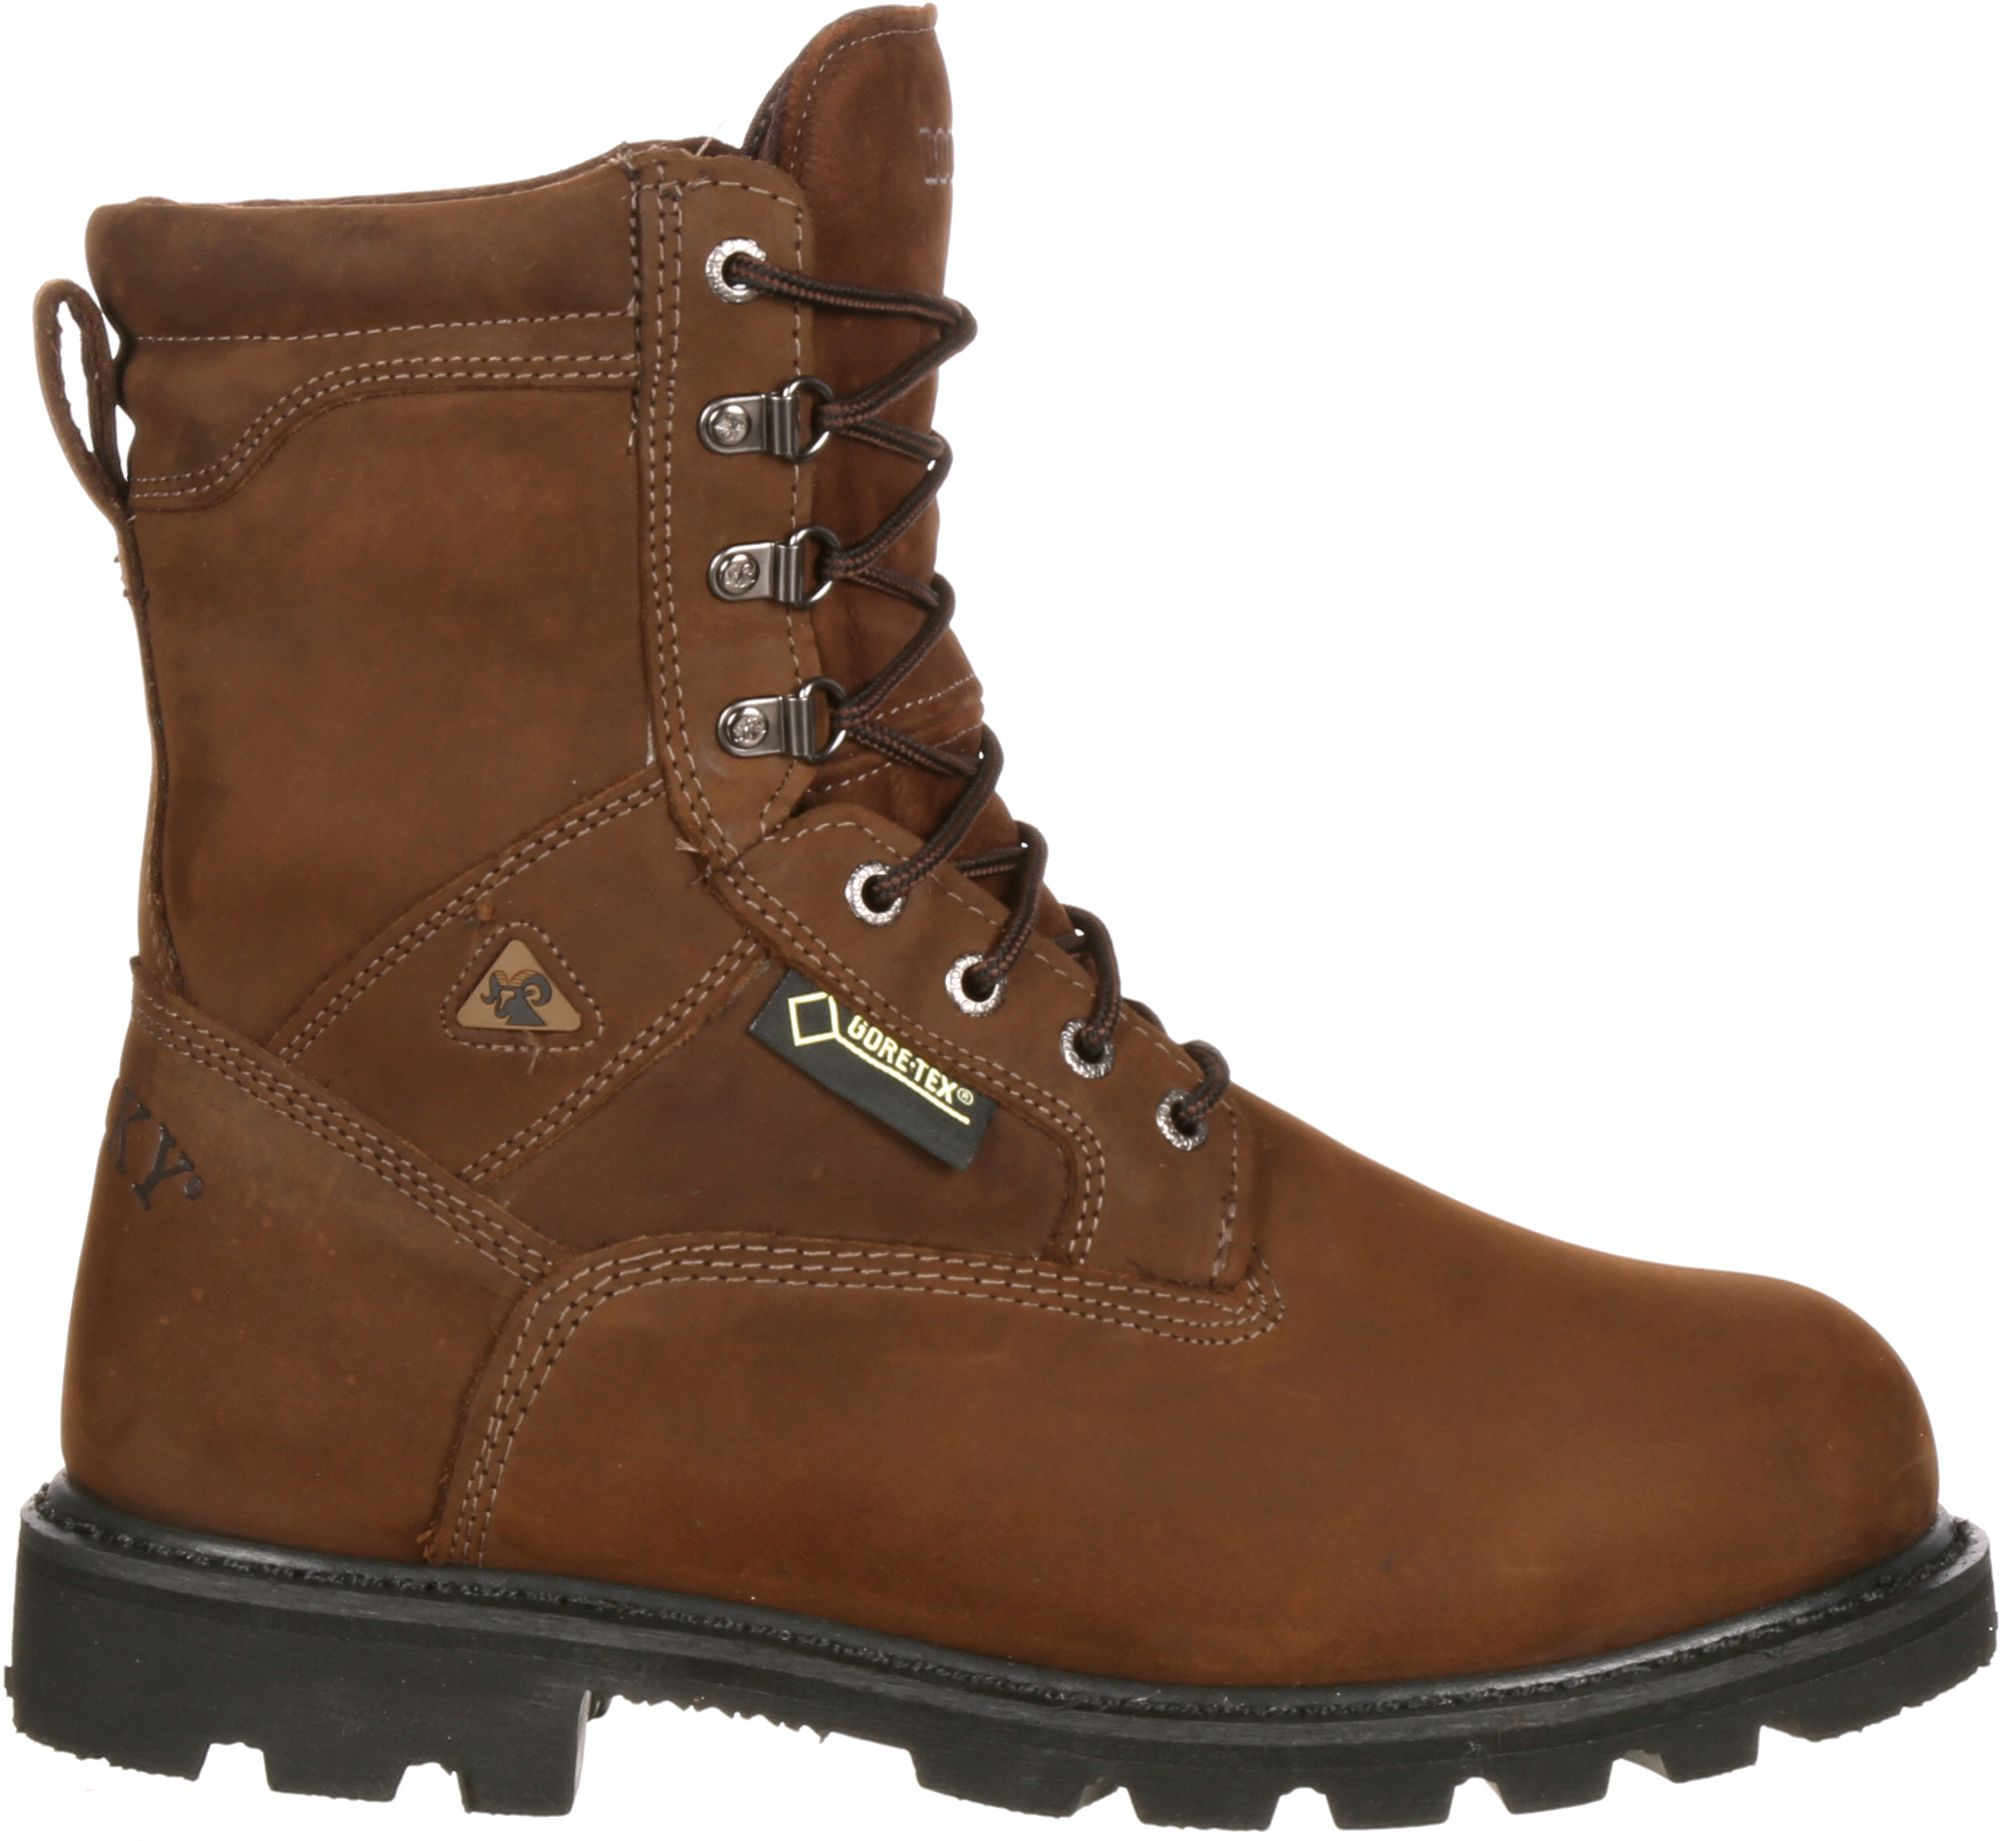 105386cb2ef Rocky Men's Original Ranger GORE-TEX 600g Steel Toe Work Boots